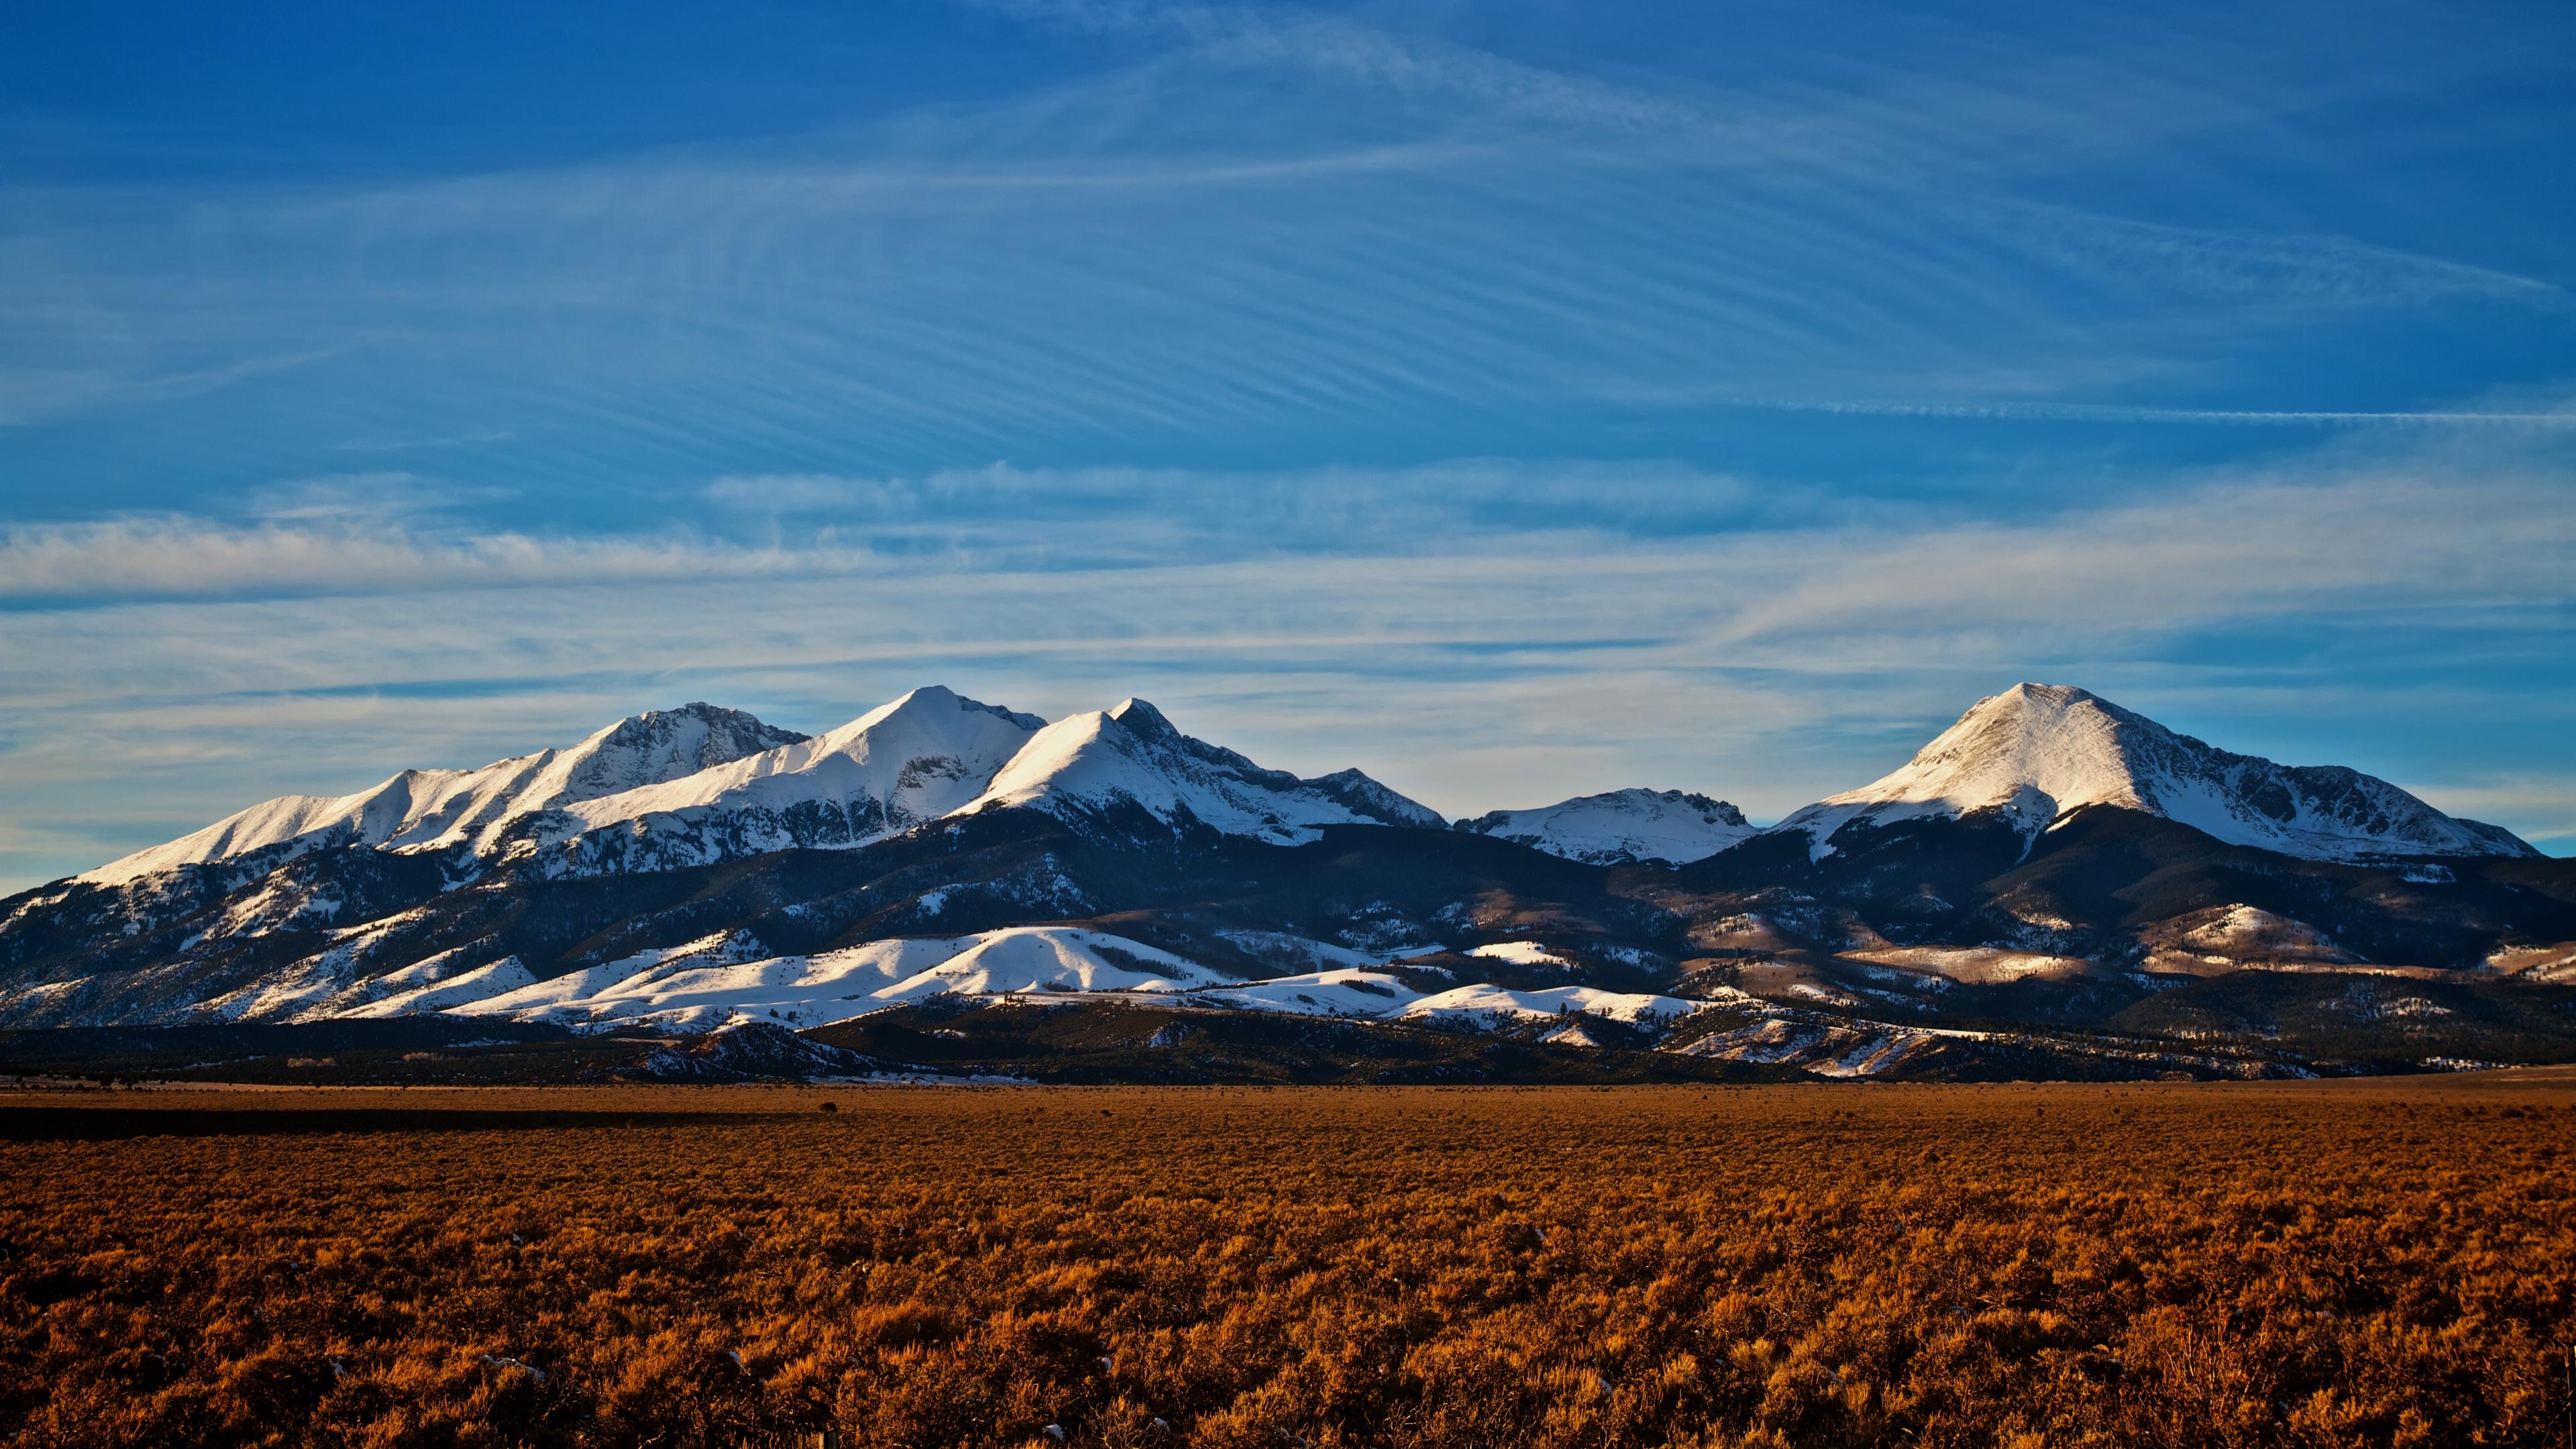 mountains colorado peaks snowy horizon sky 4k 1541113721 - mountains, colorado, peaks, snowy, horizon, sky 4k - Peaks, Mountains, Colorado